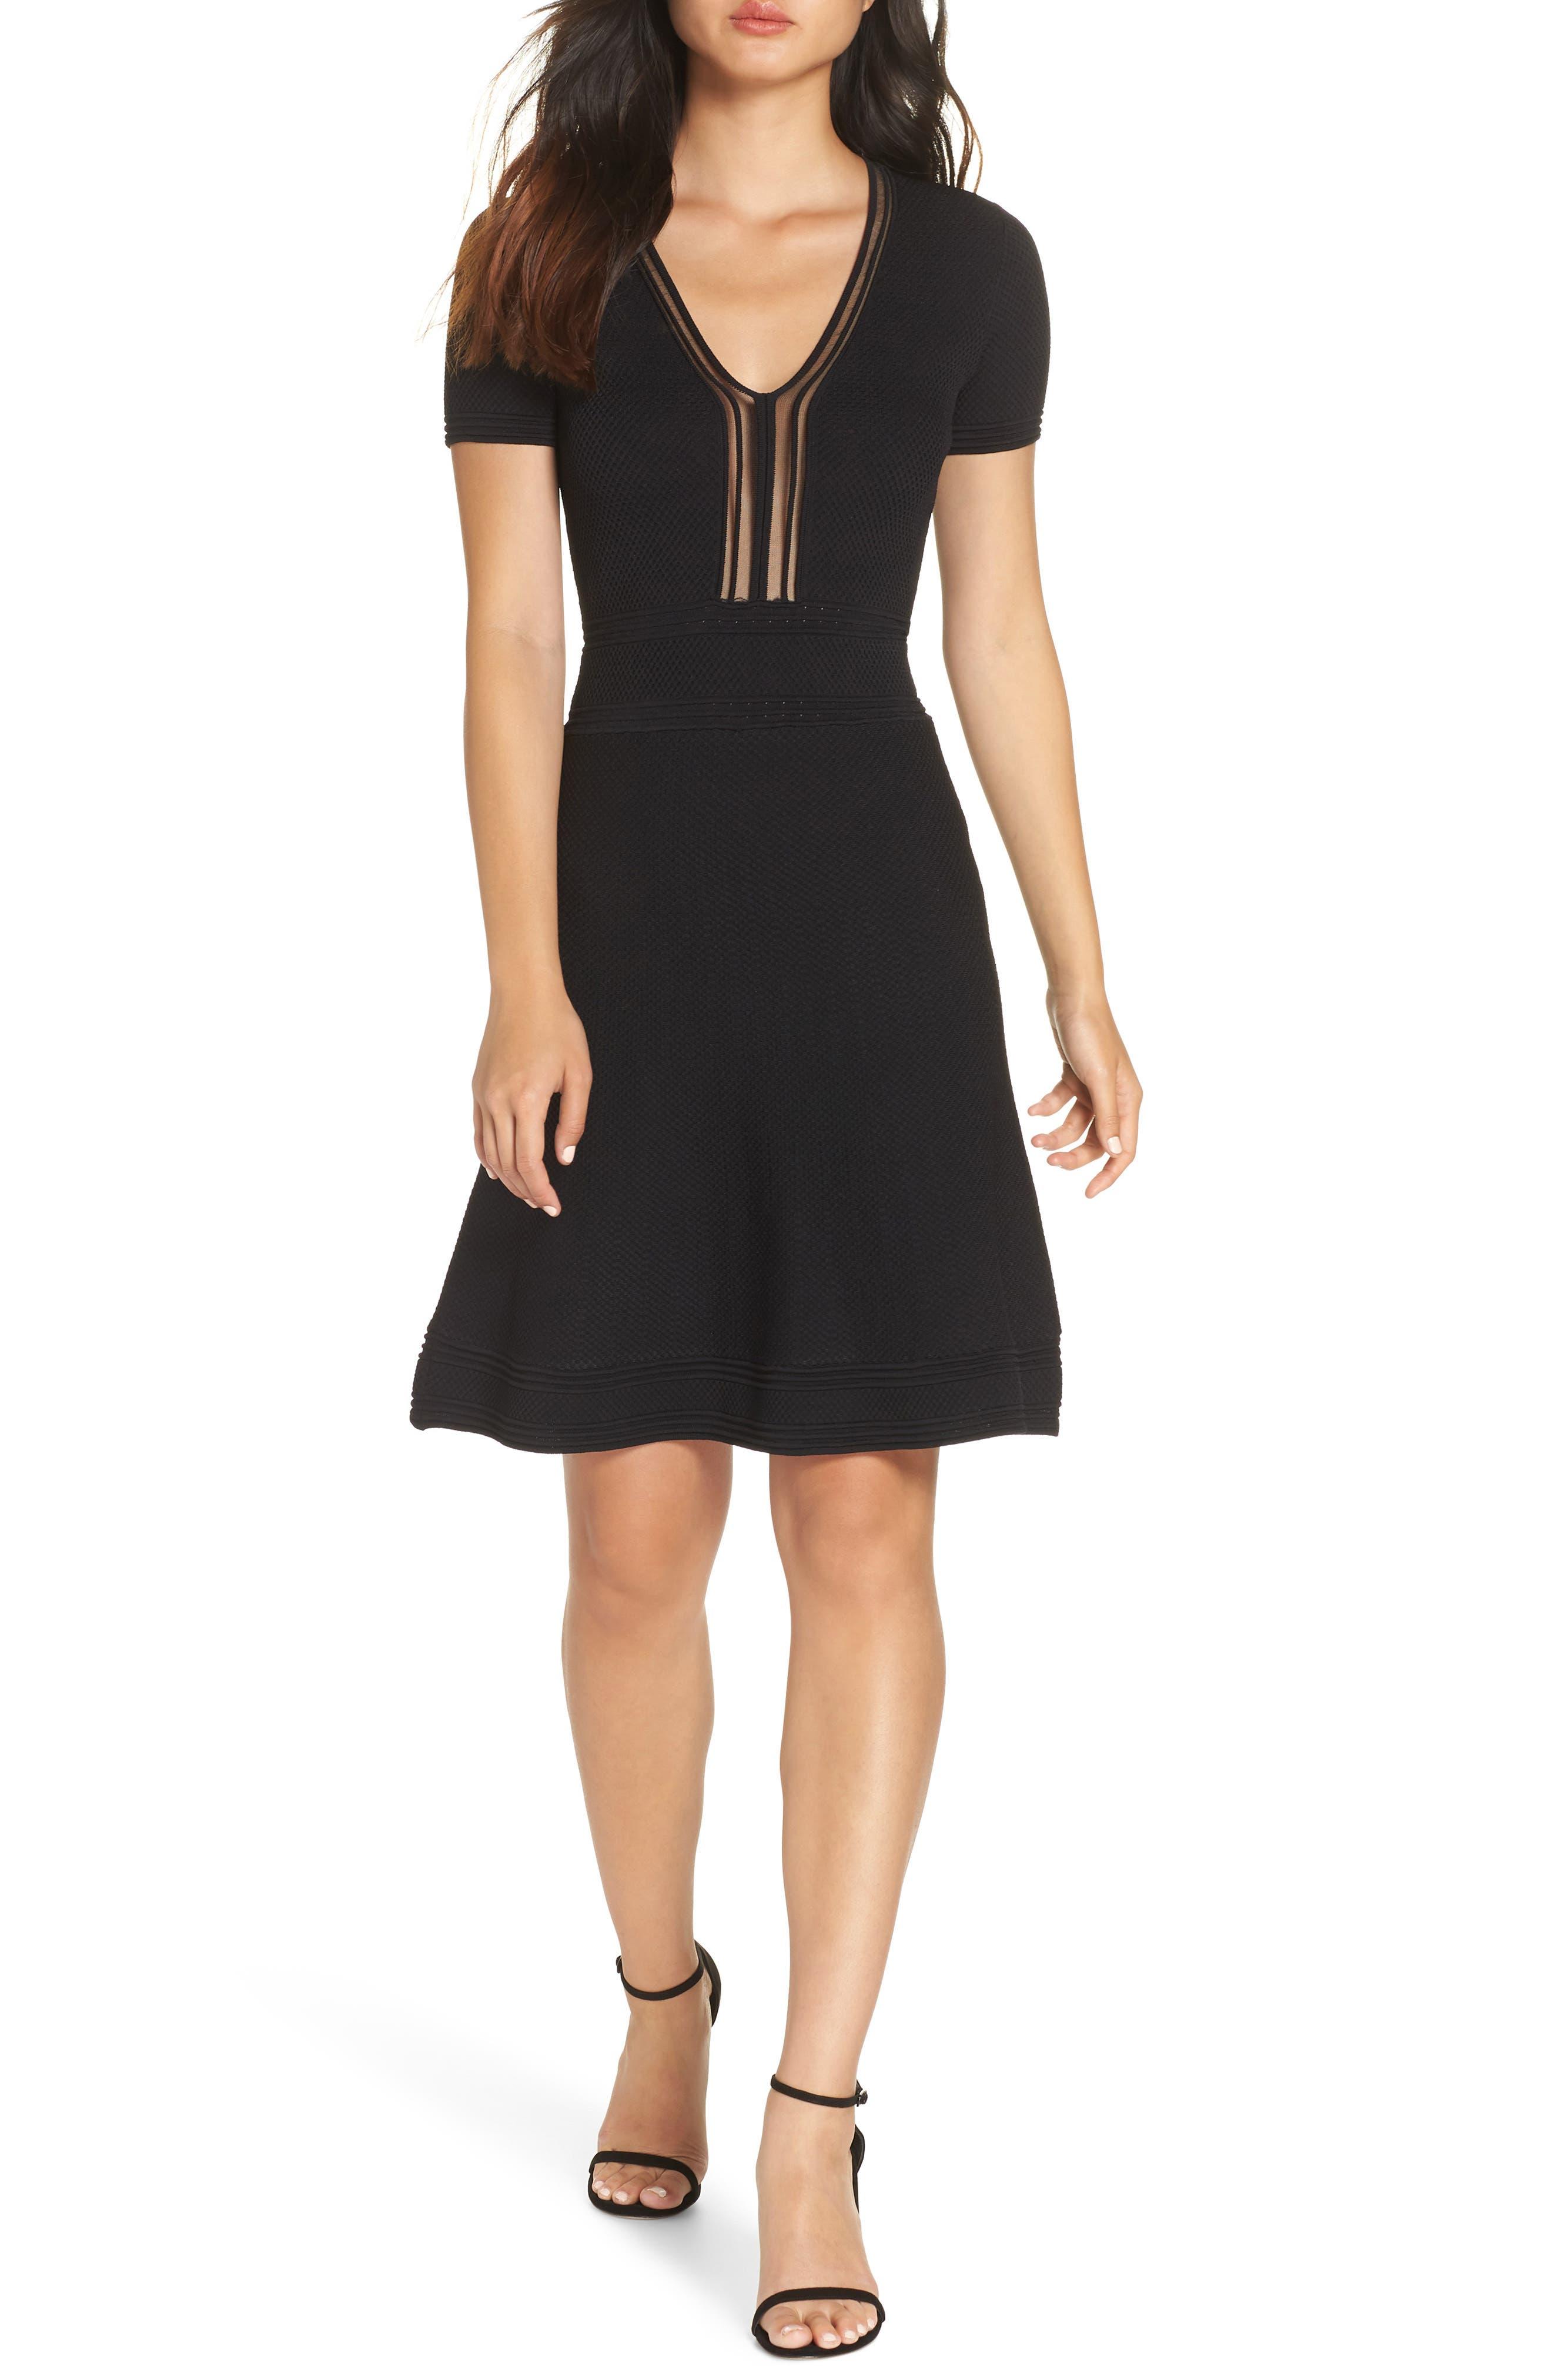 Ellie Knits V-Neck Fit & Flare Dress,                             Main thumbnail 1, color,                             BLACK